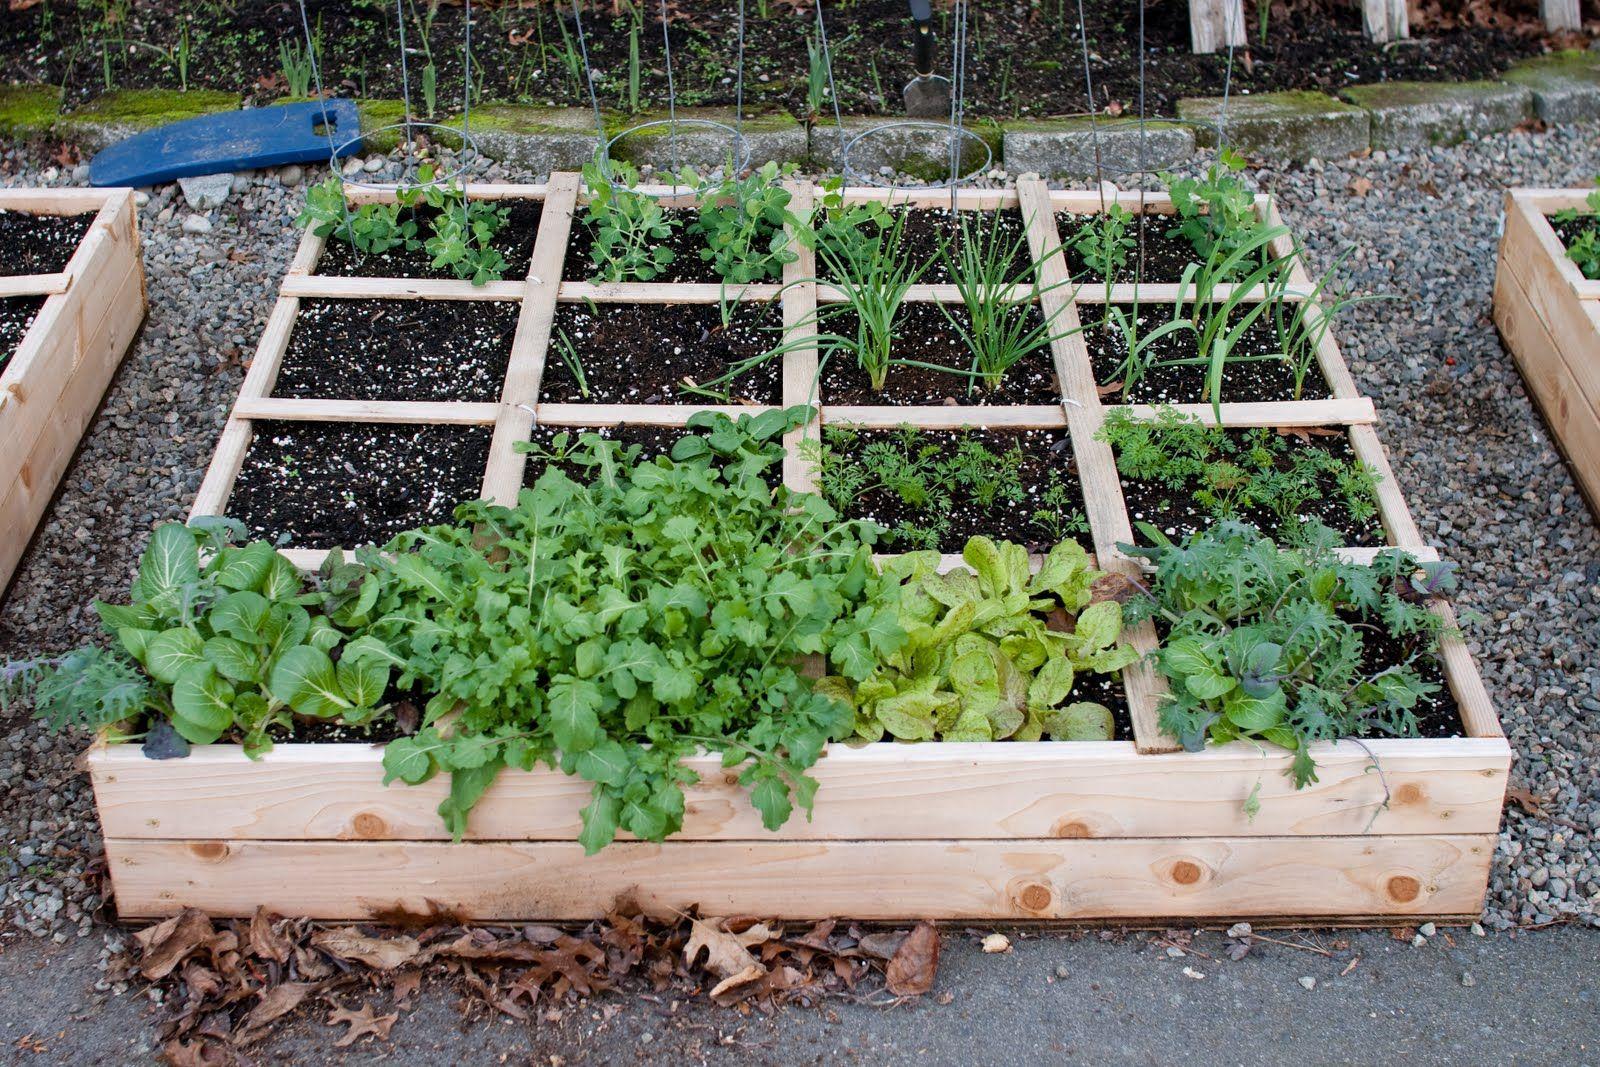 box building raised beds for raised garden beds design ideas - Raised Flower Bed Design Ideas